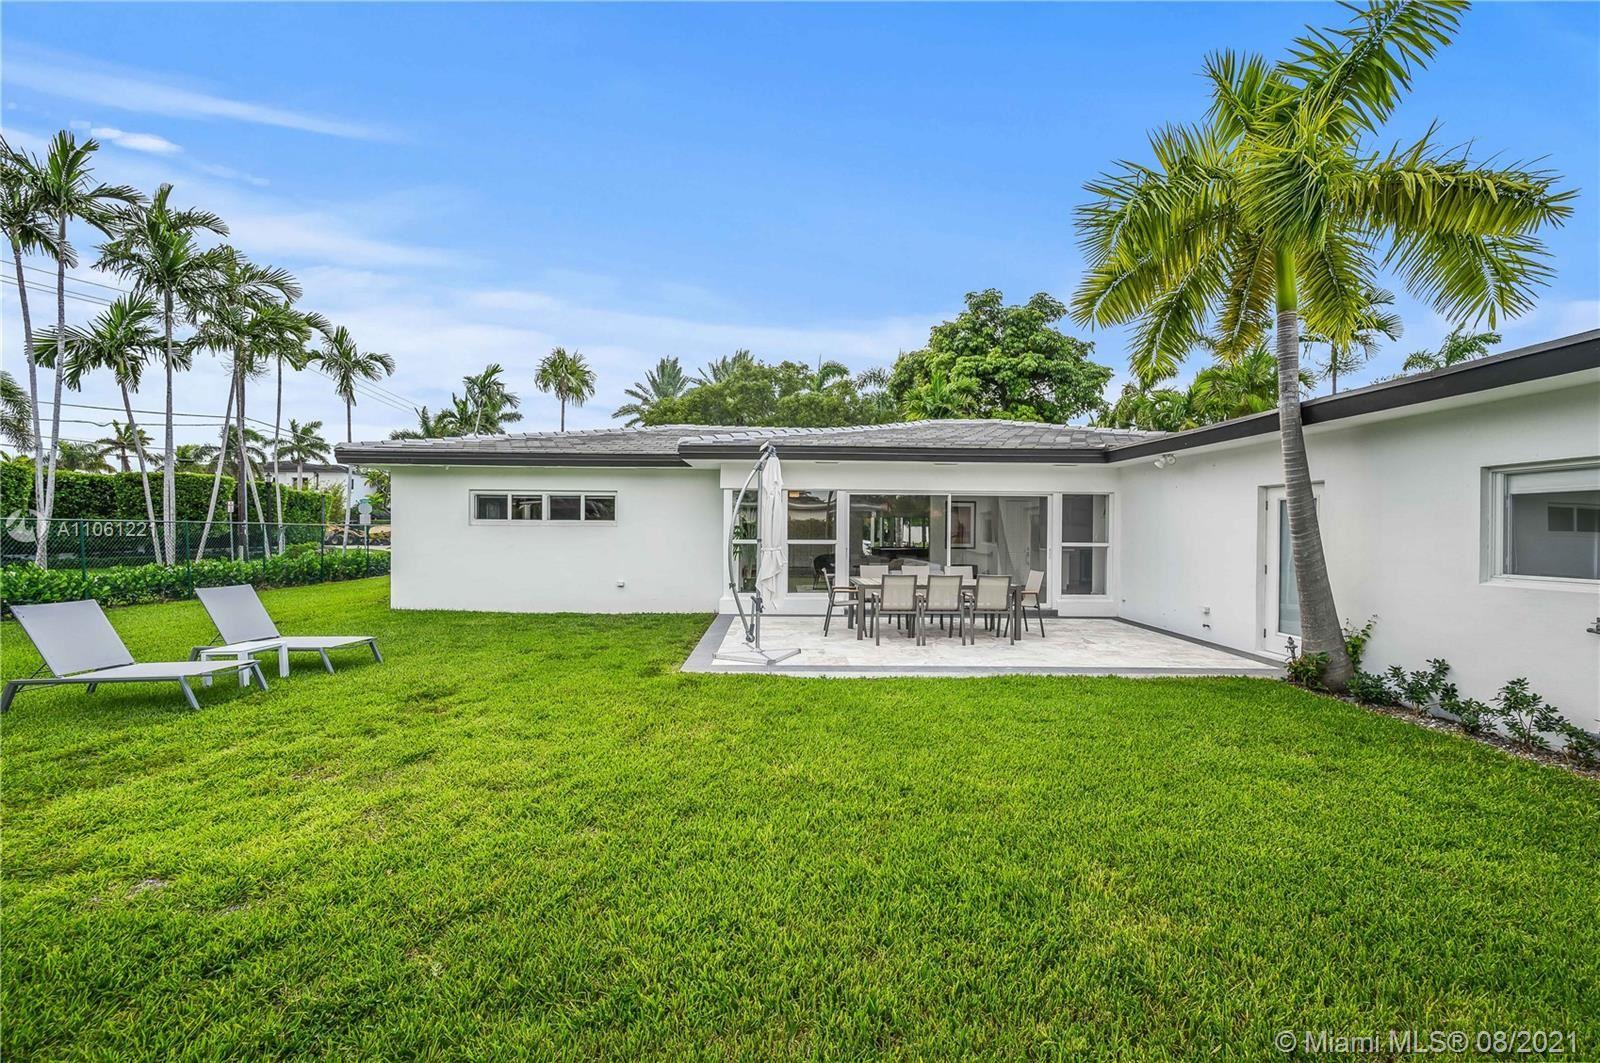 Photo of 205 S Hibiscus Dr, Miami Beach, FL 33139 (MLS # A11061221)